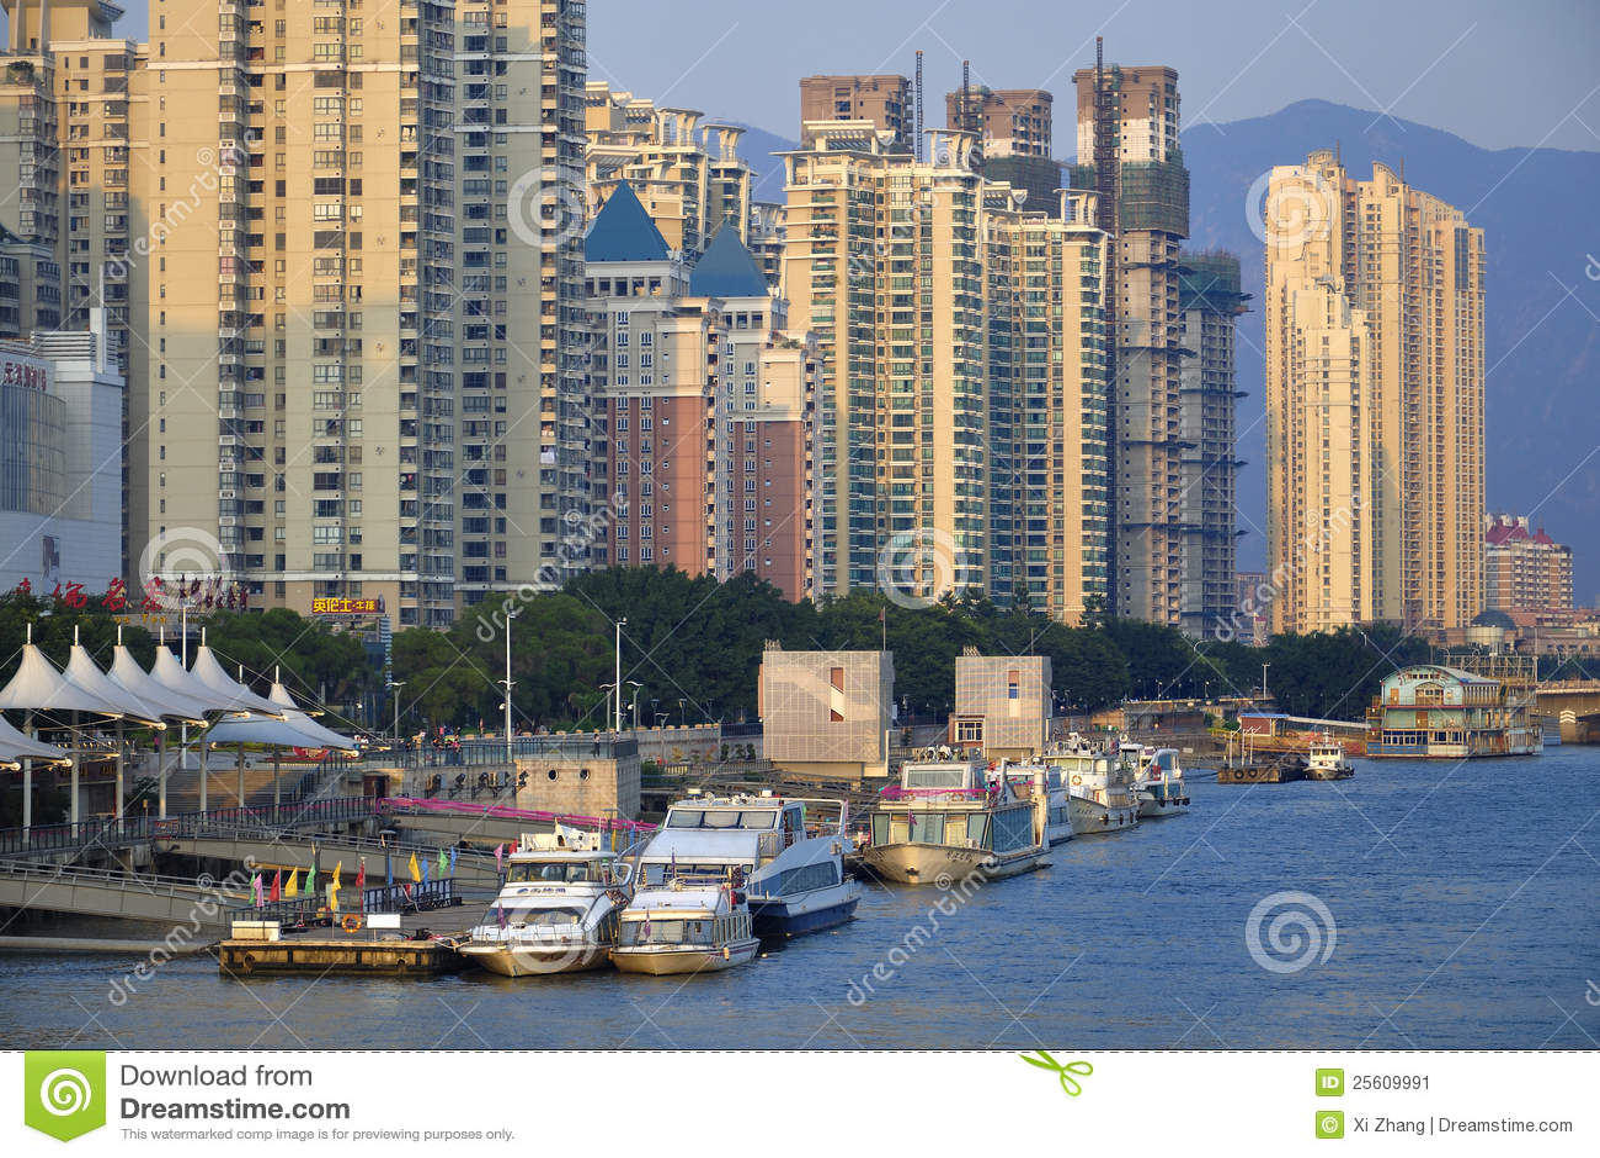 China Fuzhou Urban